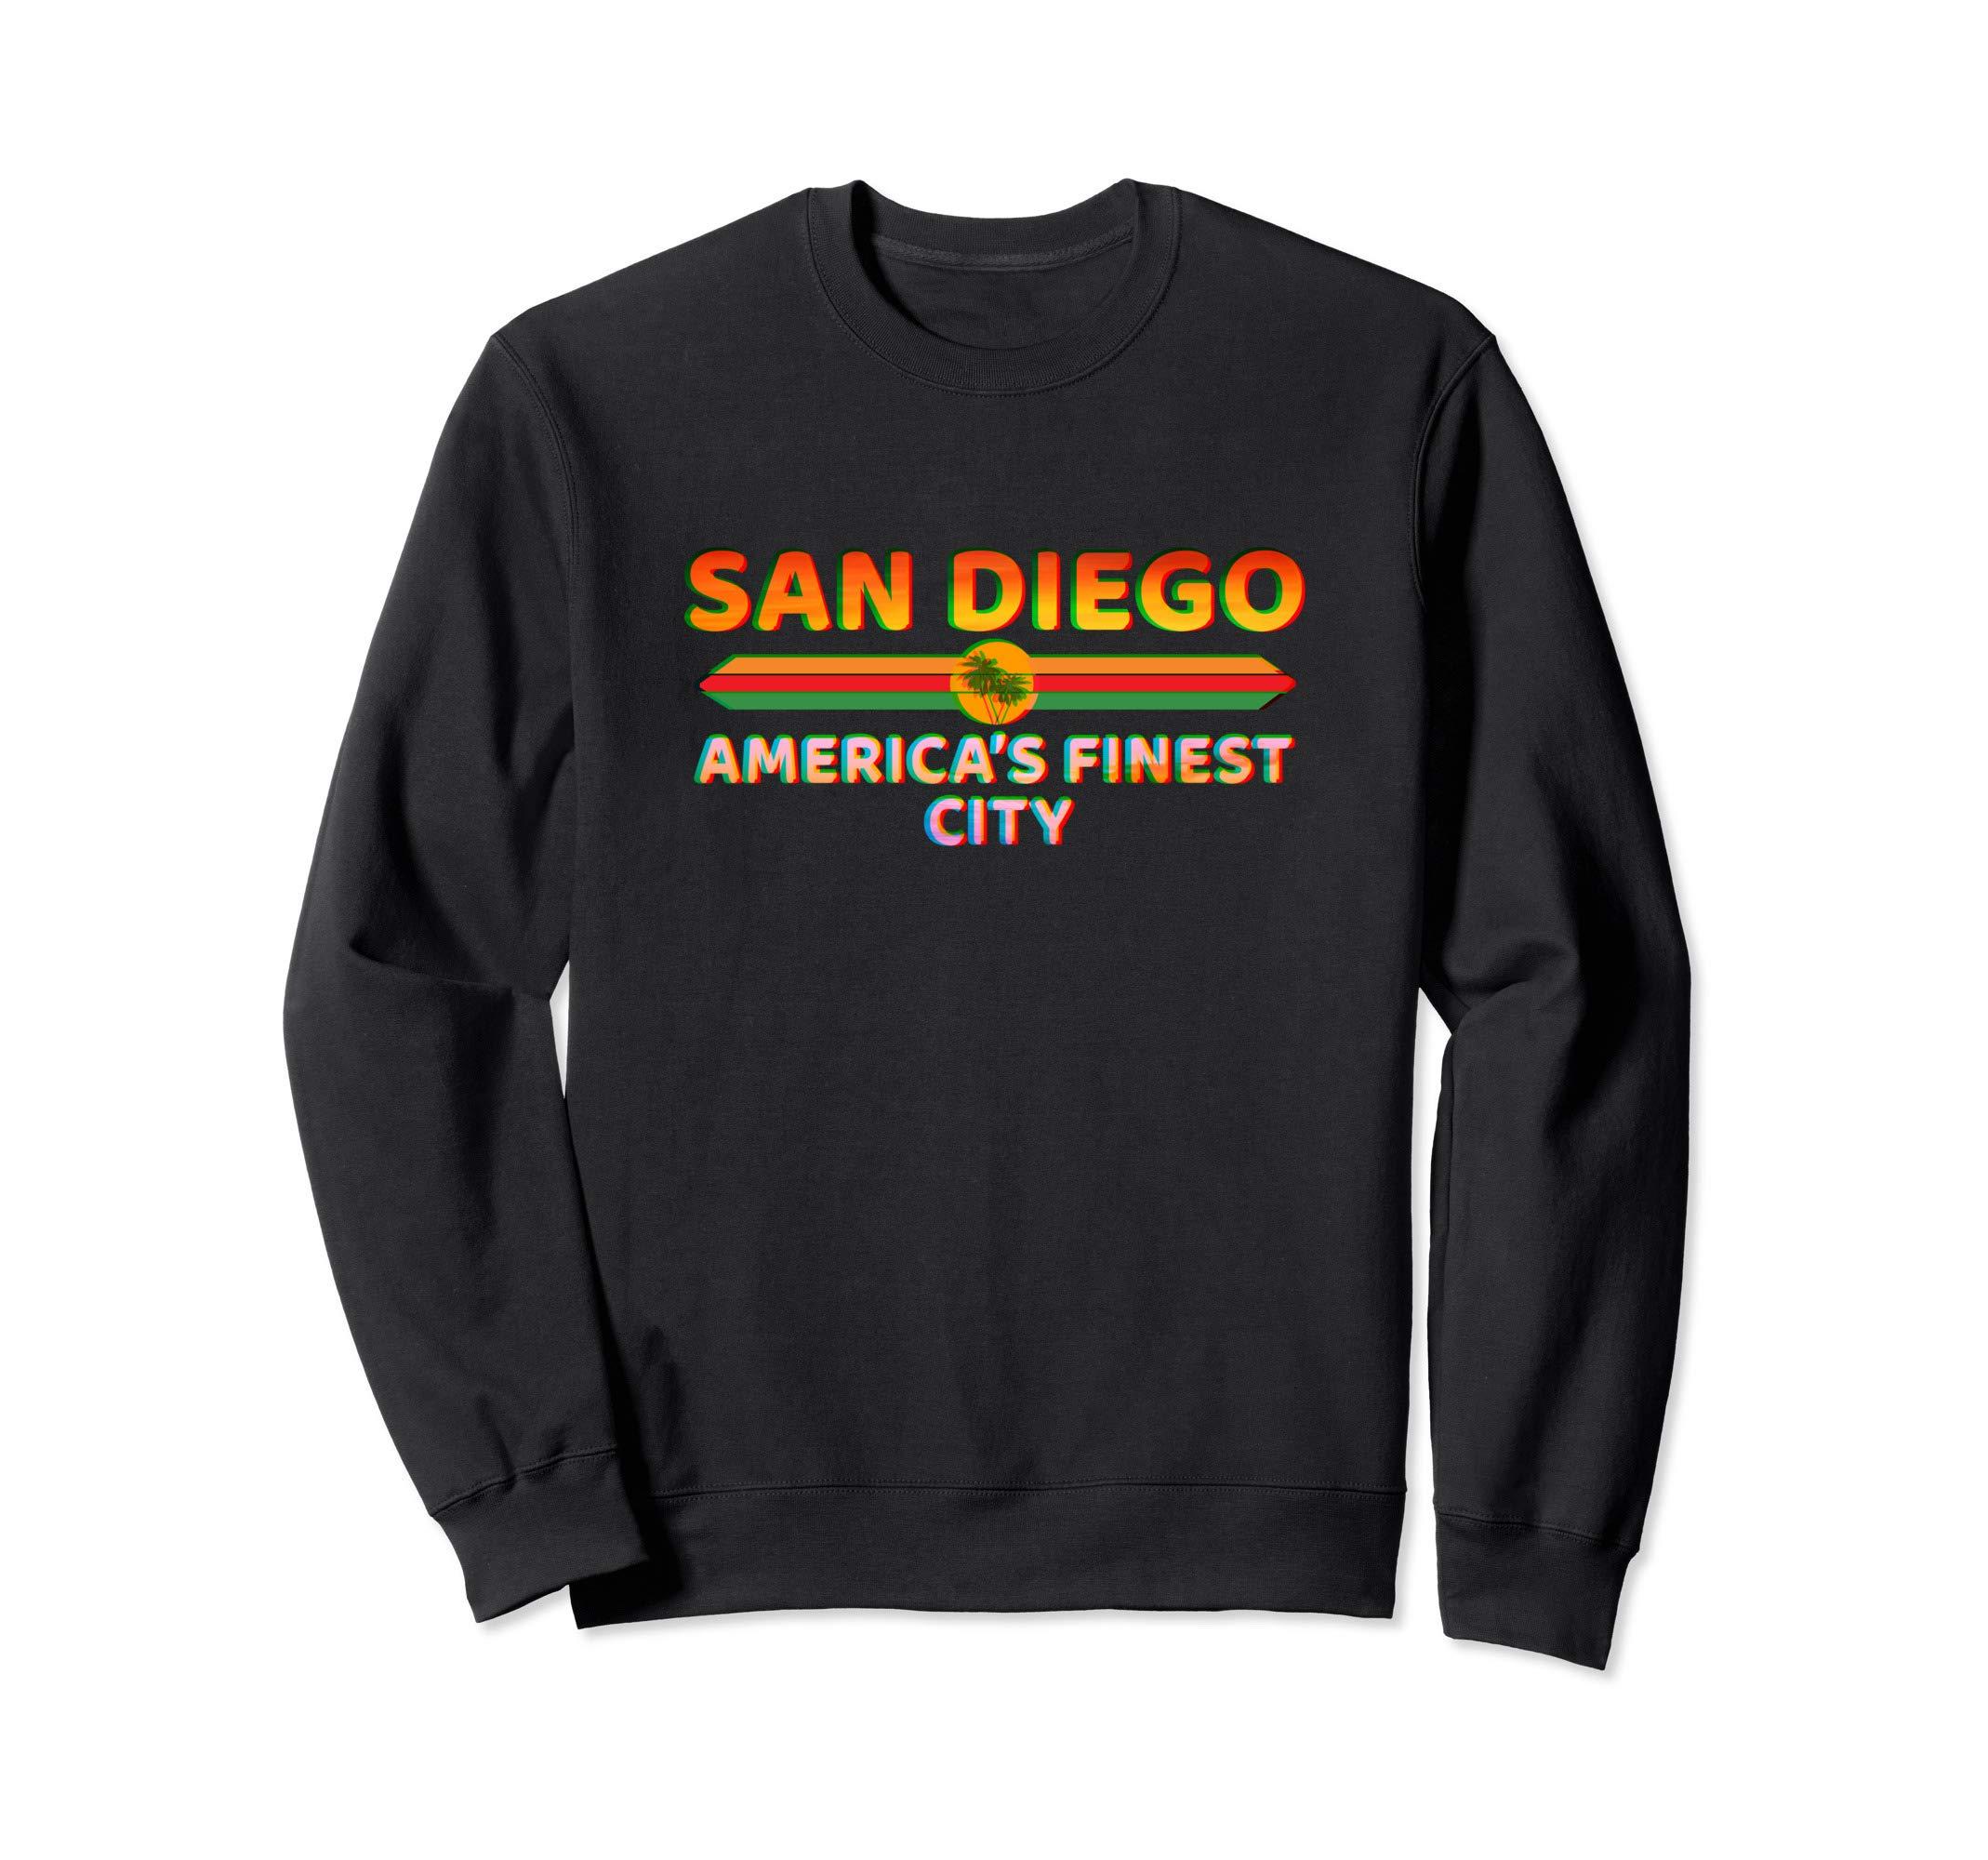 San Diego America's Finest City - California Retro San Diego Sweatshirt by La Ferte-Bernard